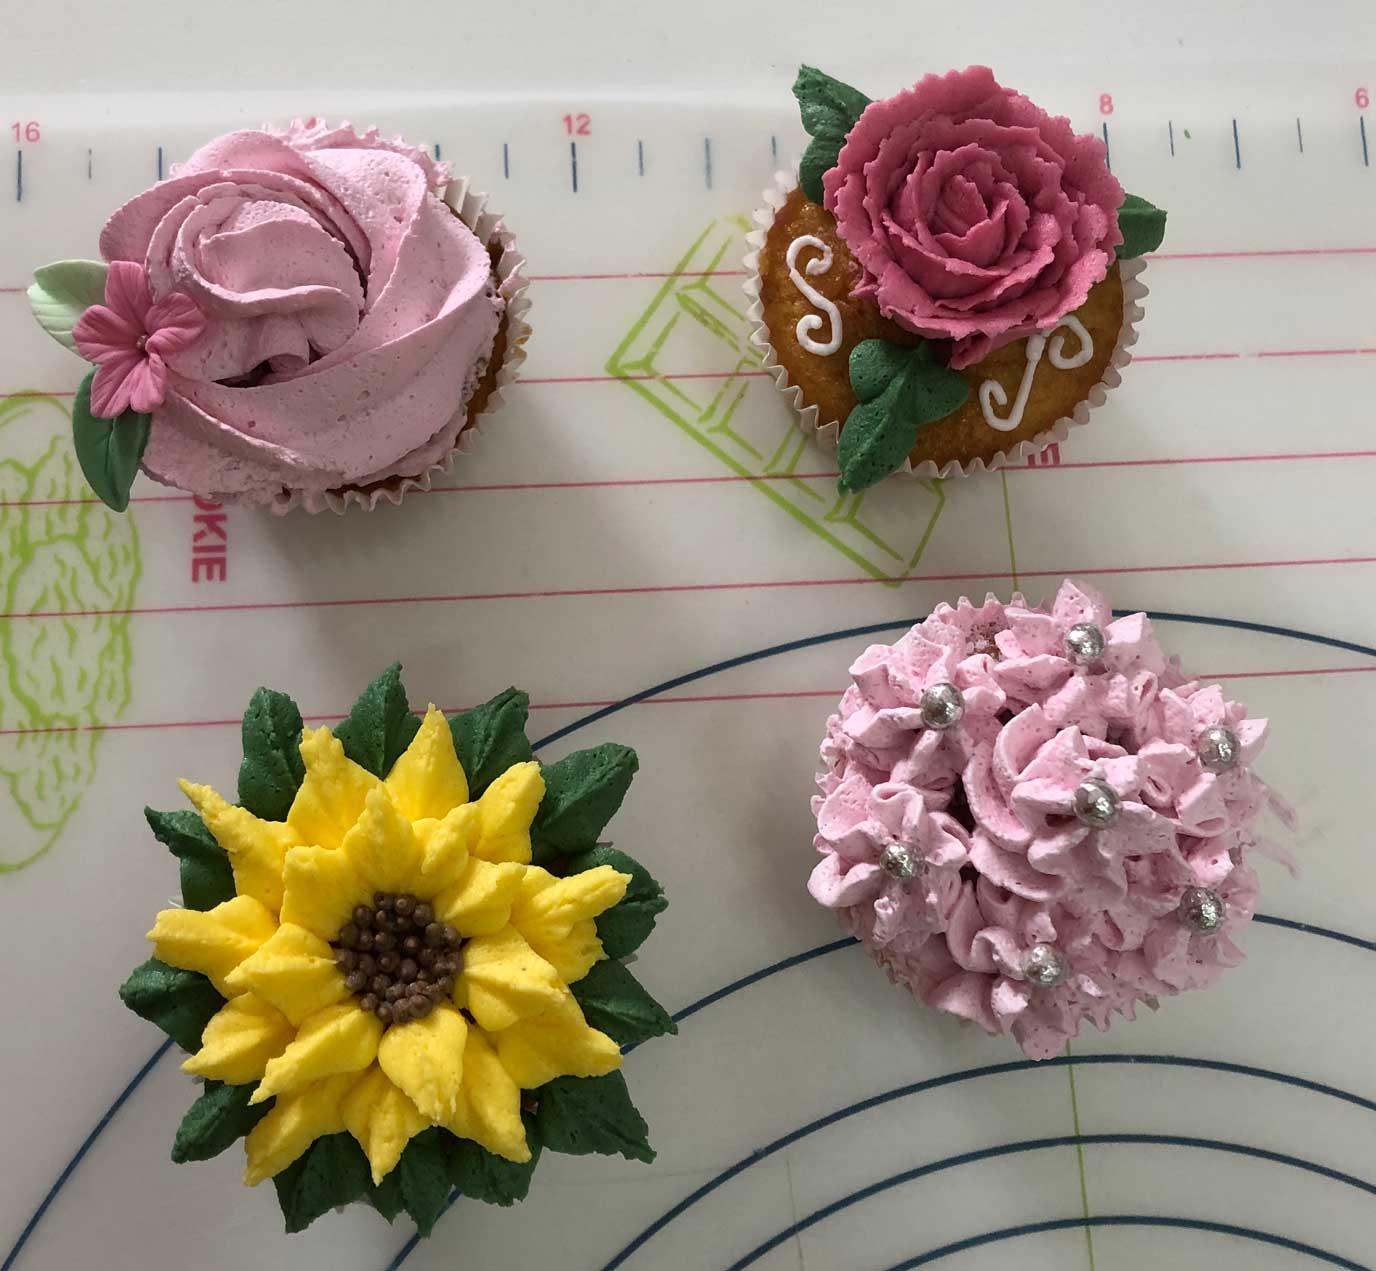 mamacake_reposteria_creativa_sevilla_curso_cupcakes_buttercream6